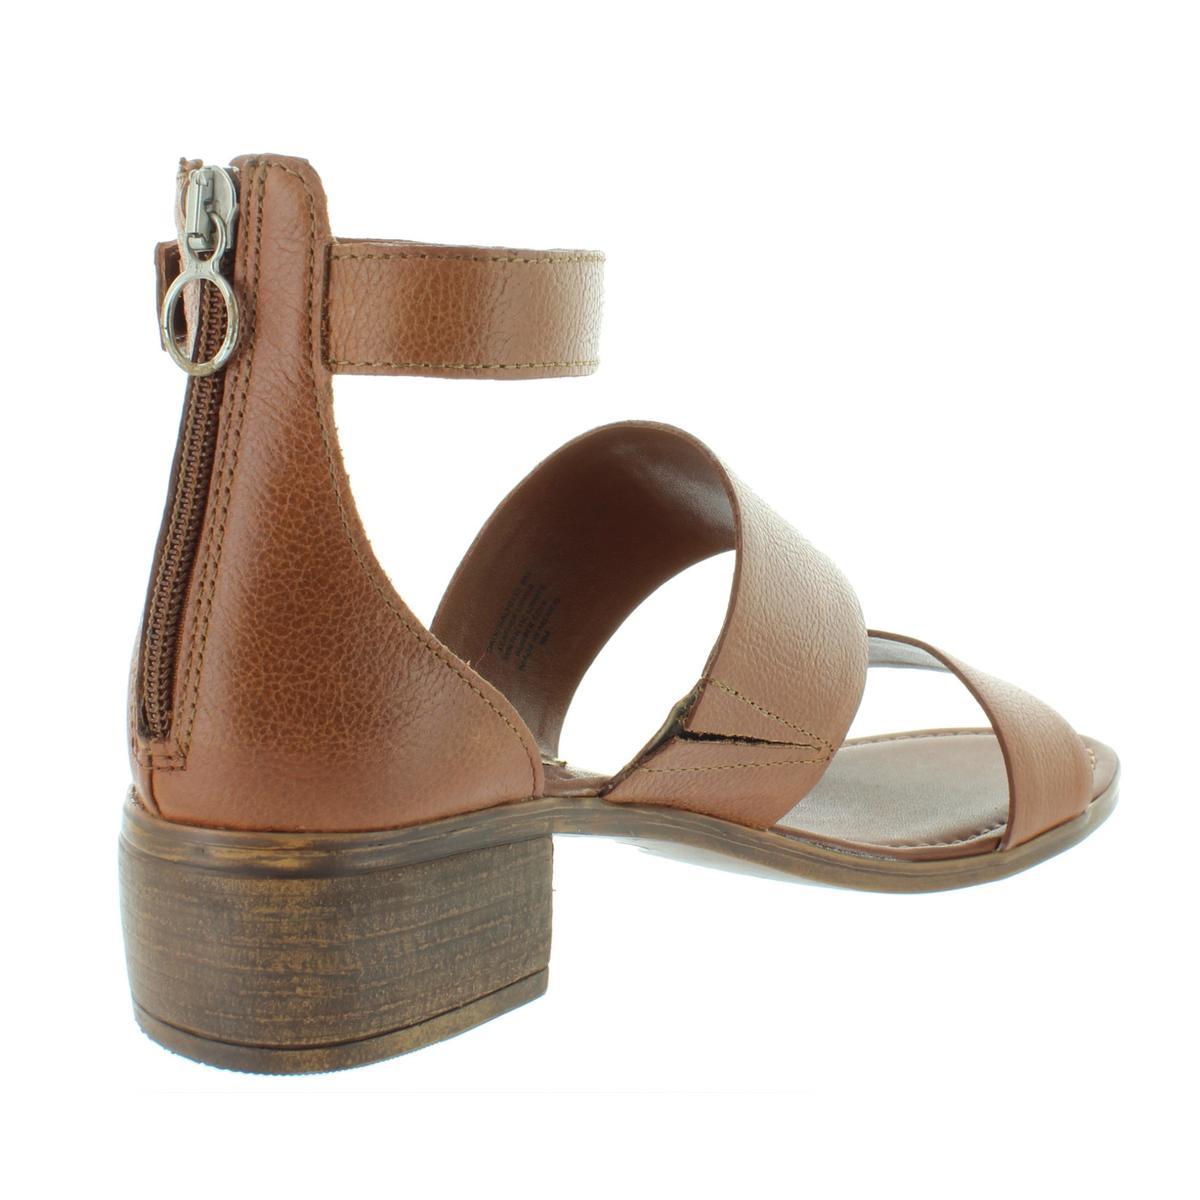 Steve-Madden-Womens-Daly-Leather-Open-Toe-Dress-Heels-Sandals-BHFO-5458 thumbnail 6